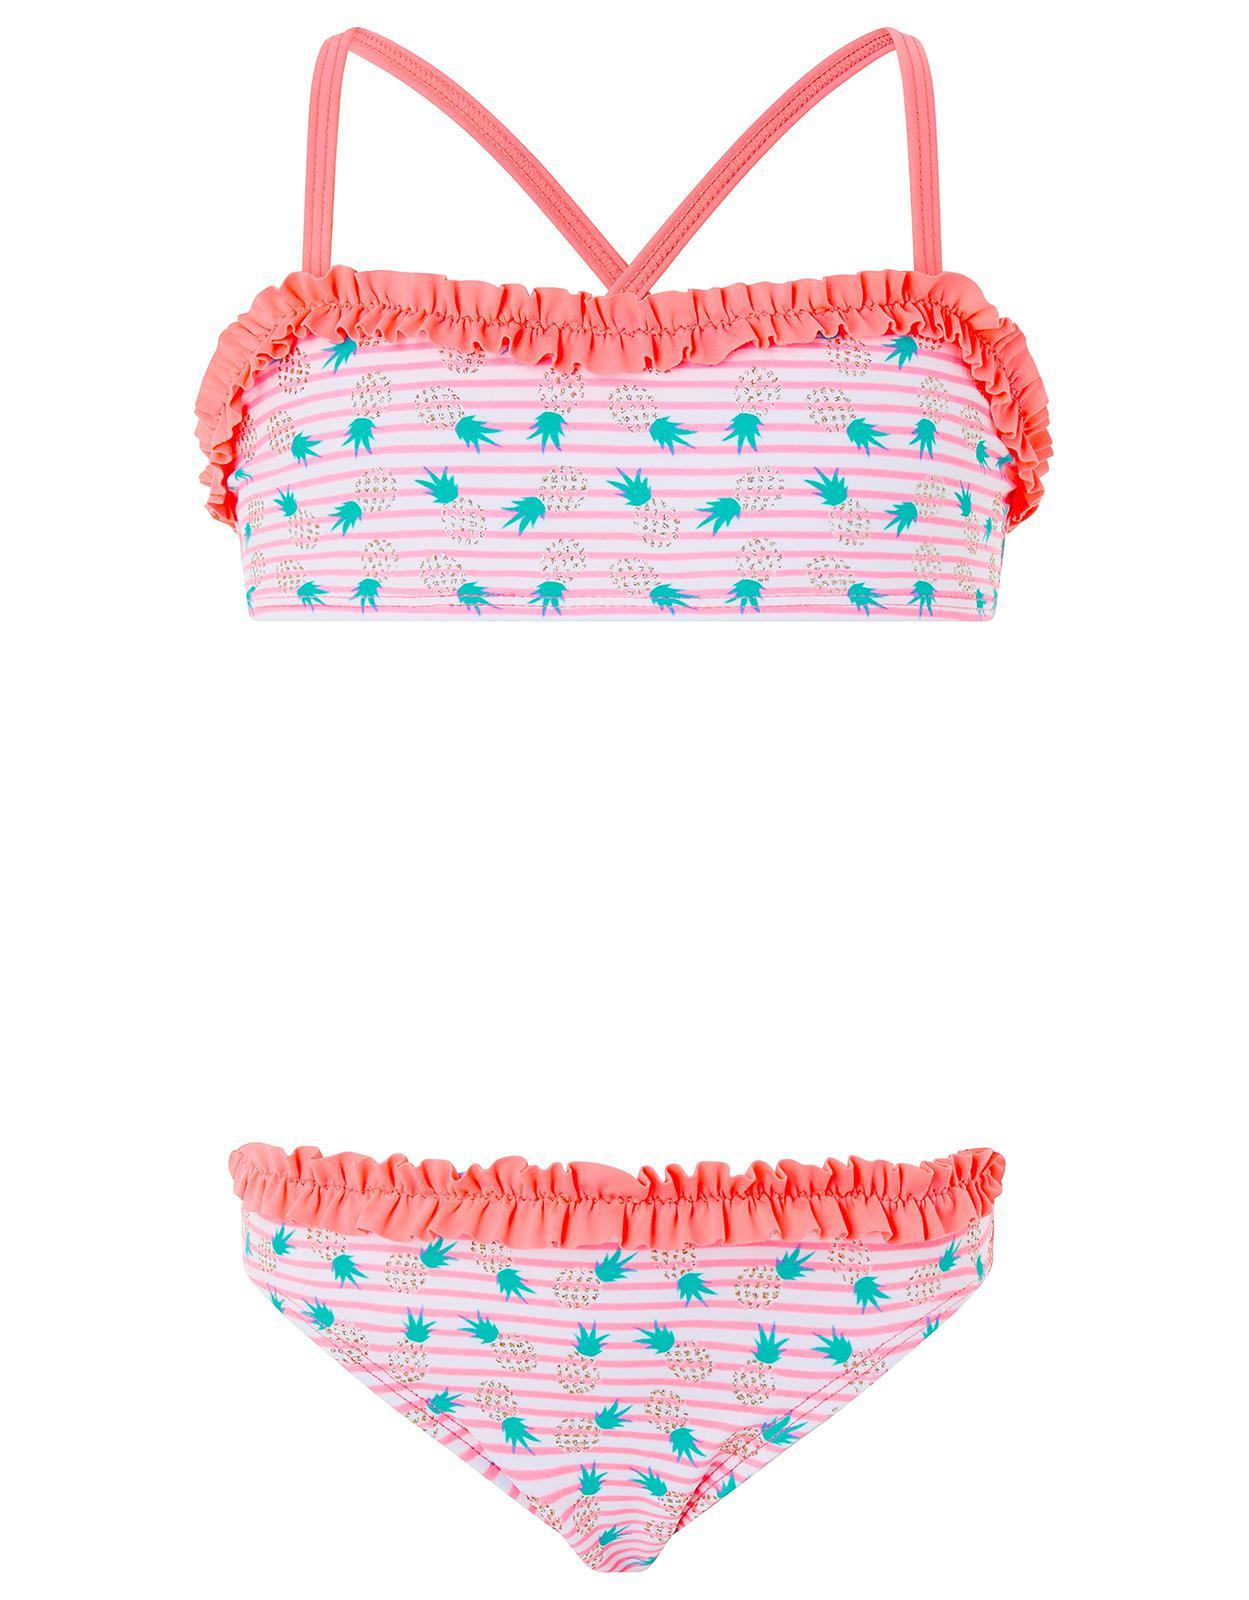 1852afd8234 Accessorize Paradise Pineapple Ruffle Bikini in Pink - Lyst